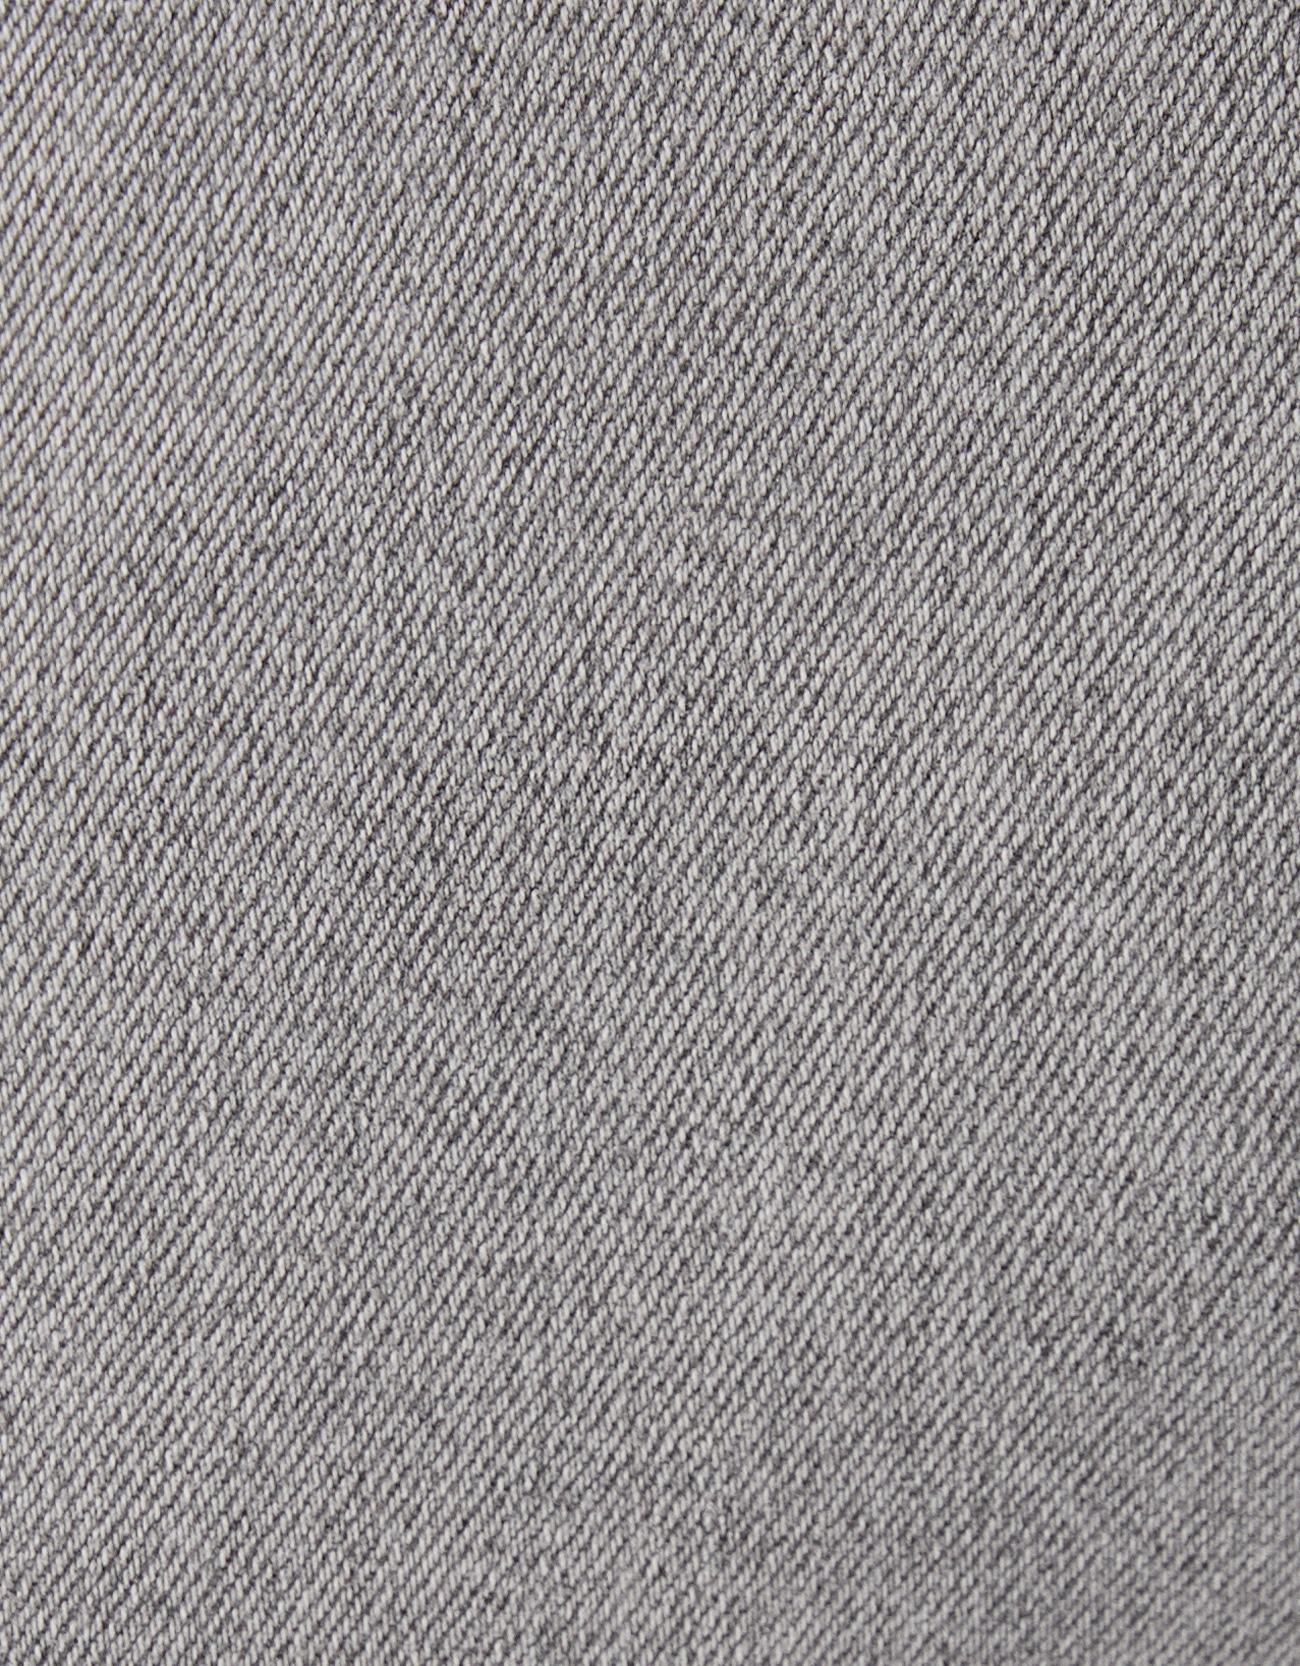 1c1c8ac9804e Skinny high waist jeans - New - Bershka Macedonia